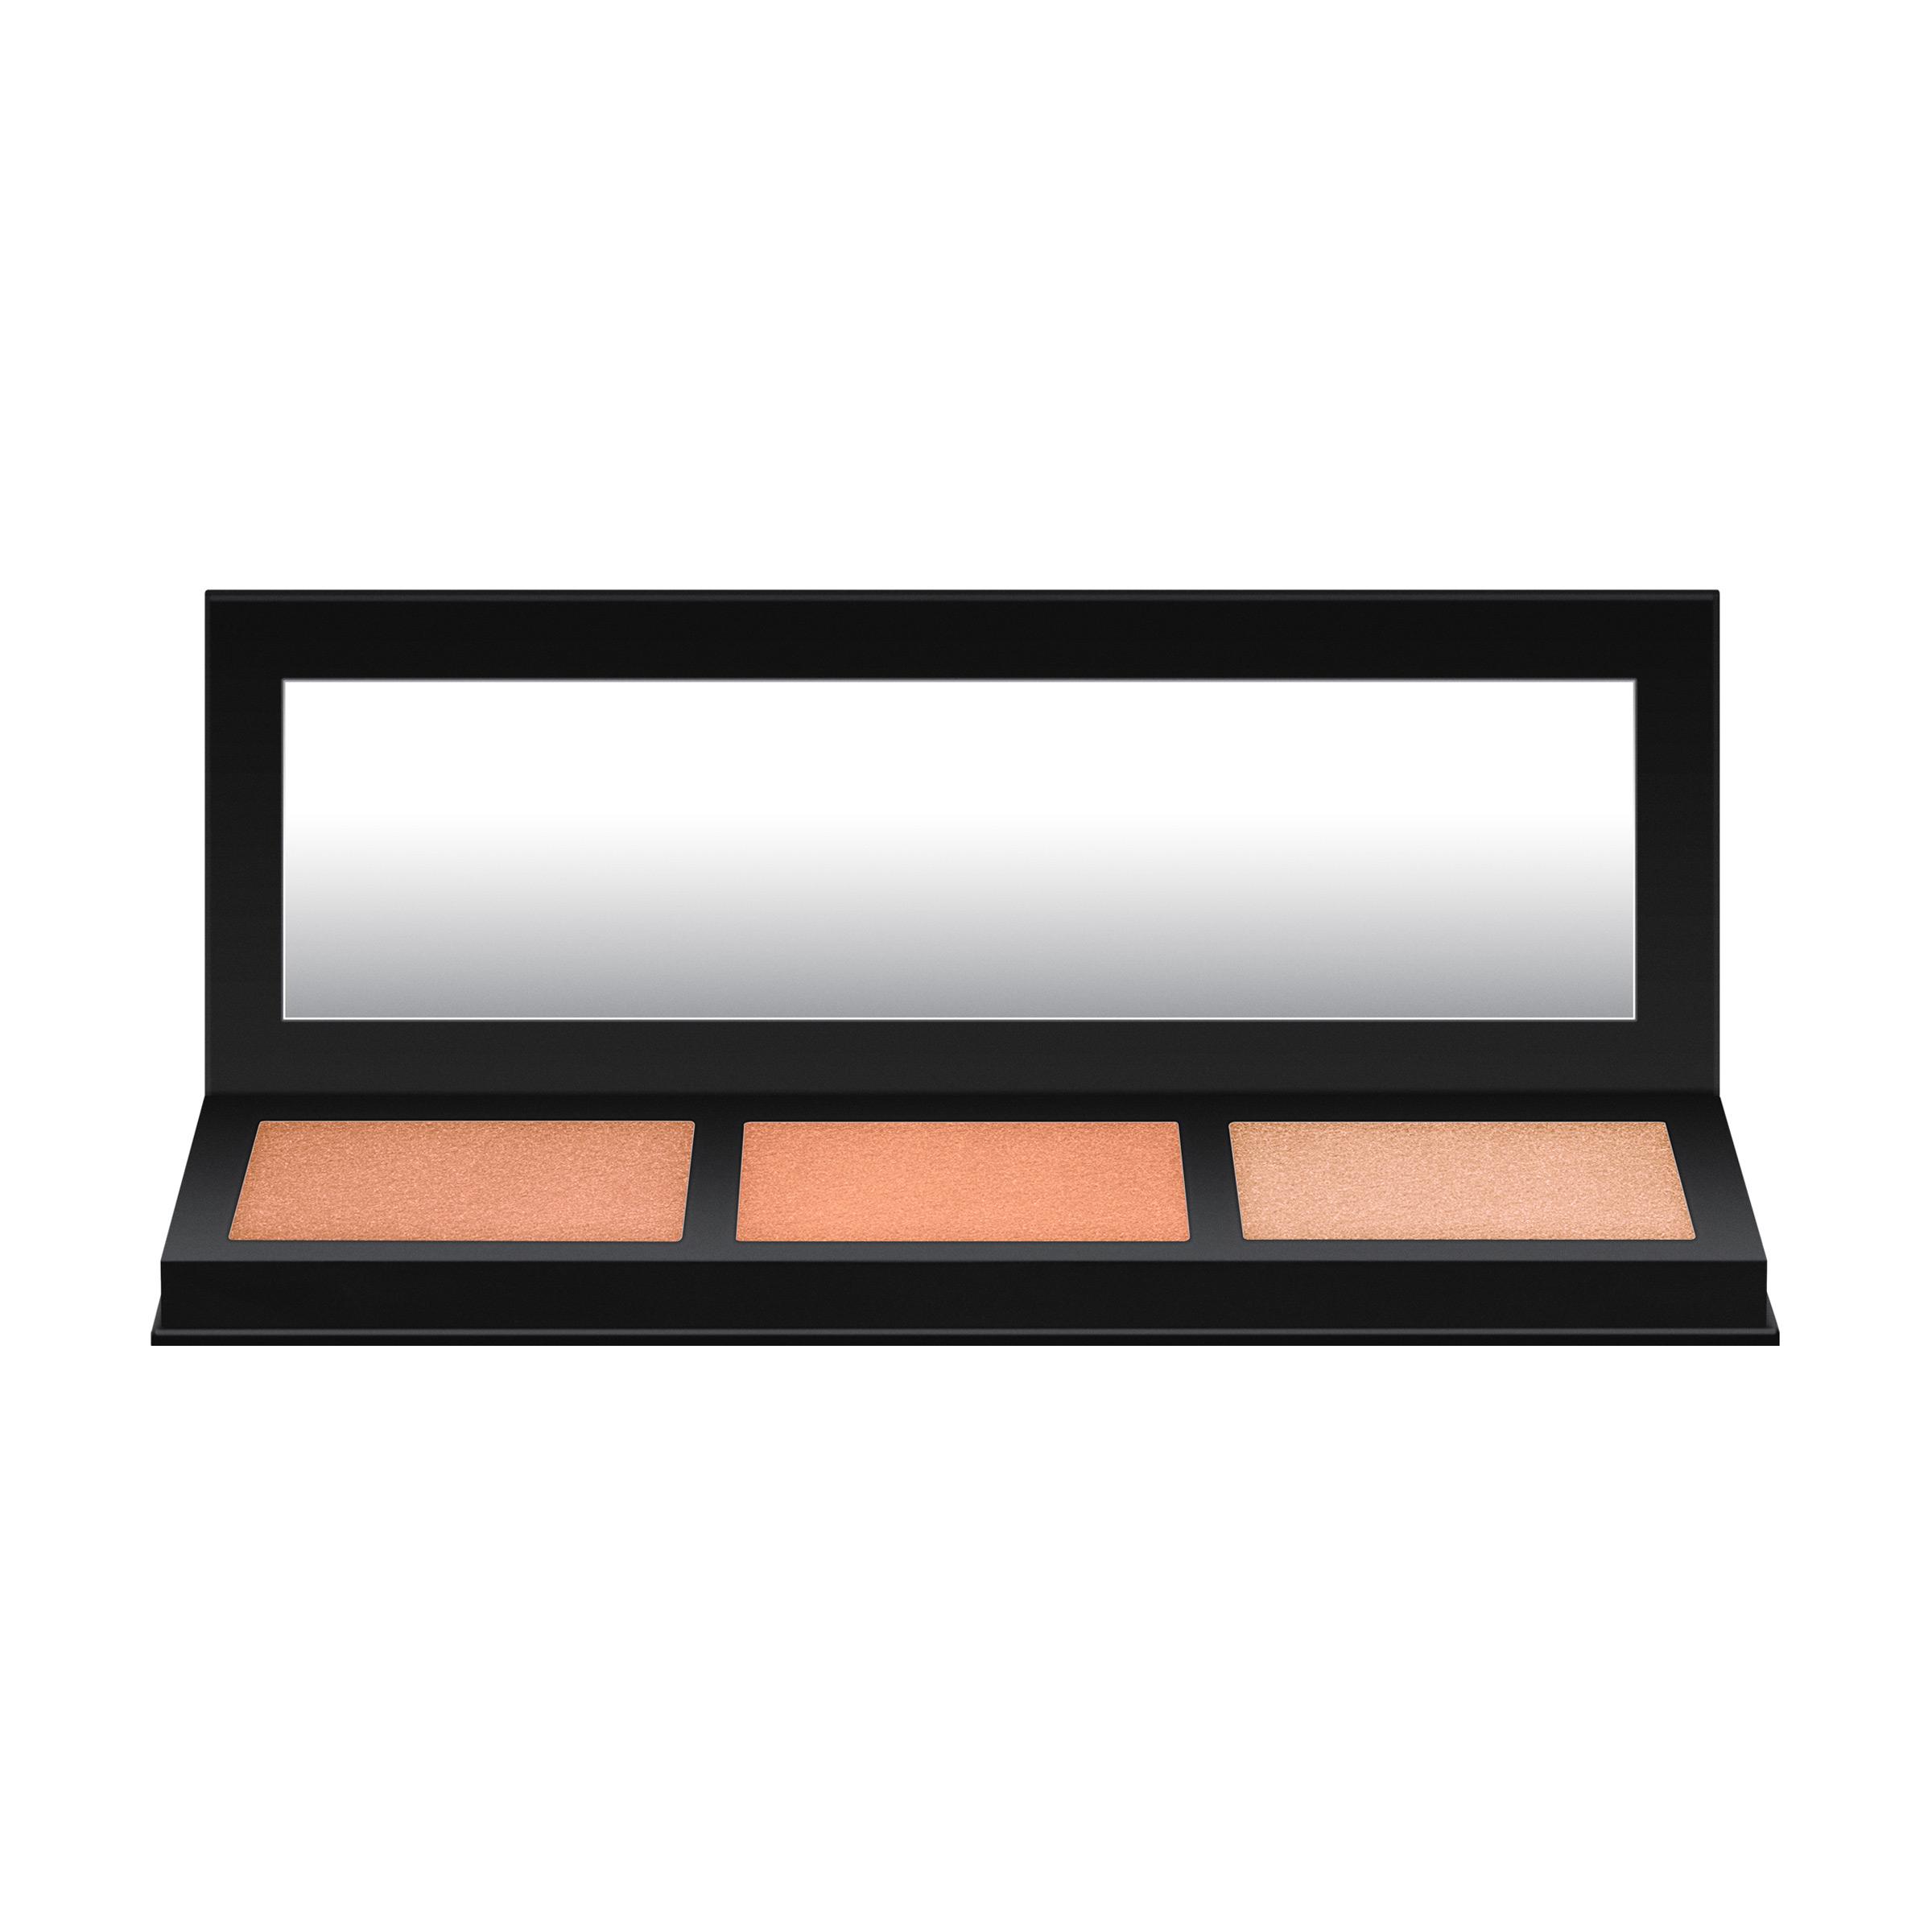 Hyper Real Glow Palette Shimmy Peach SHIMMY PEACH